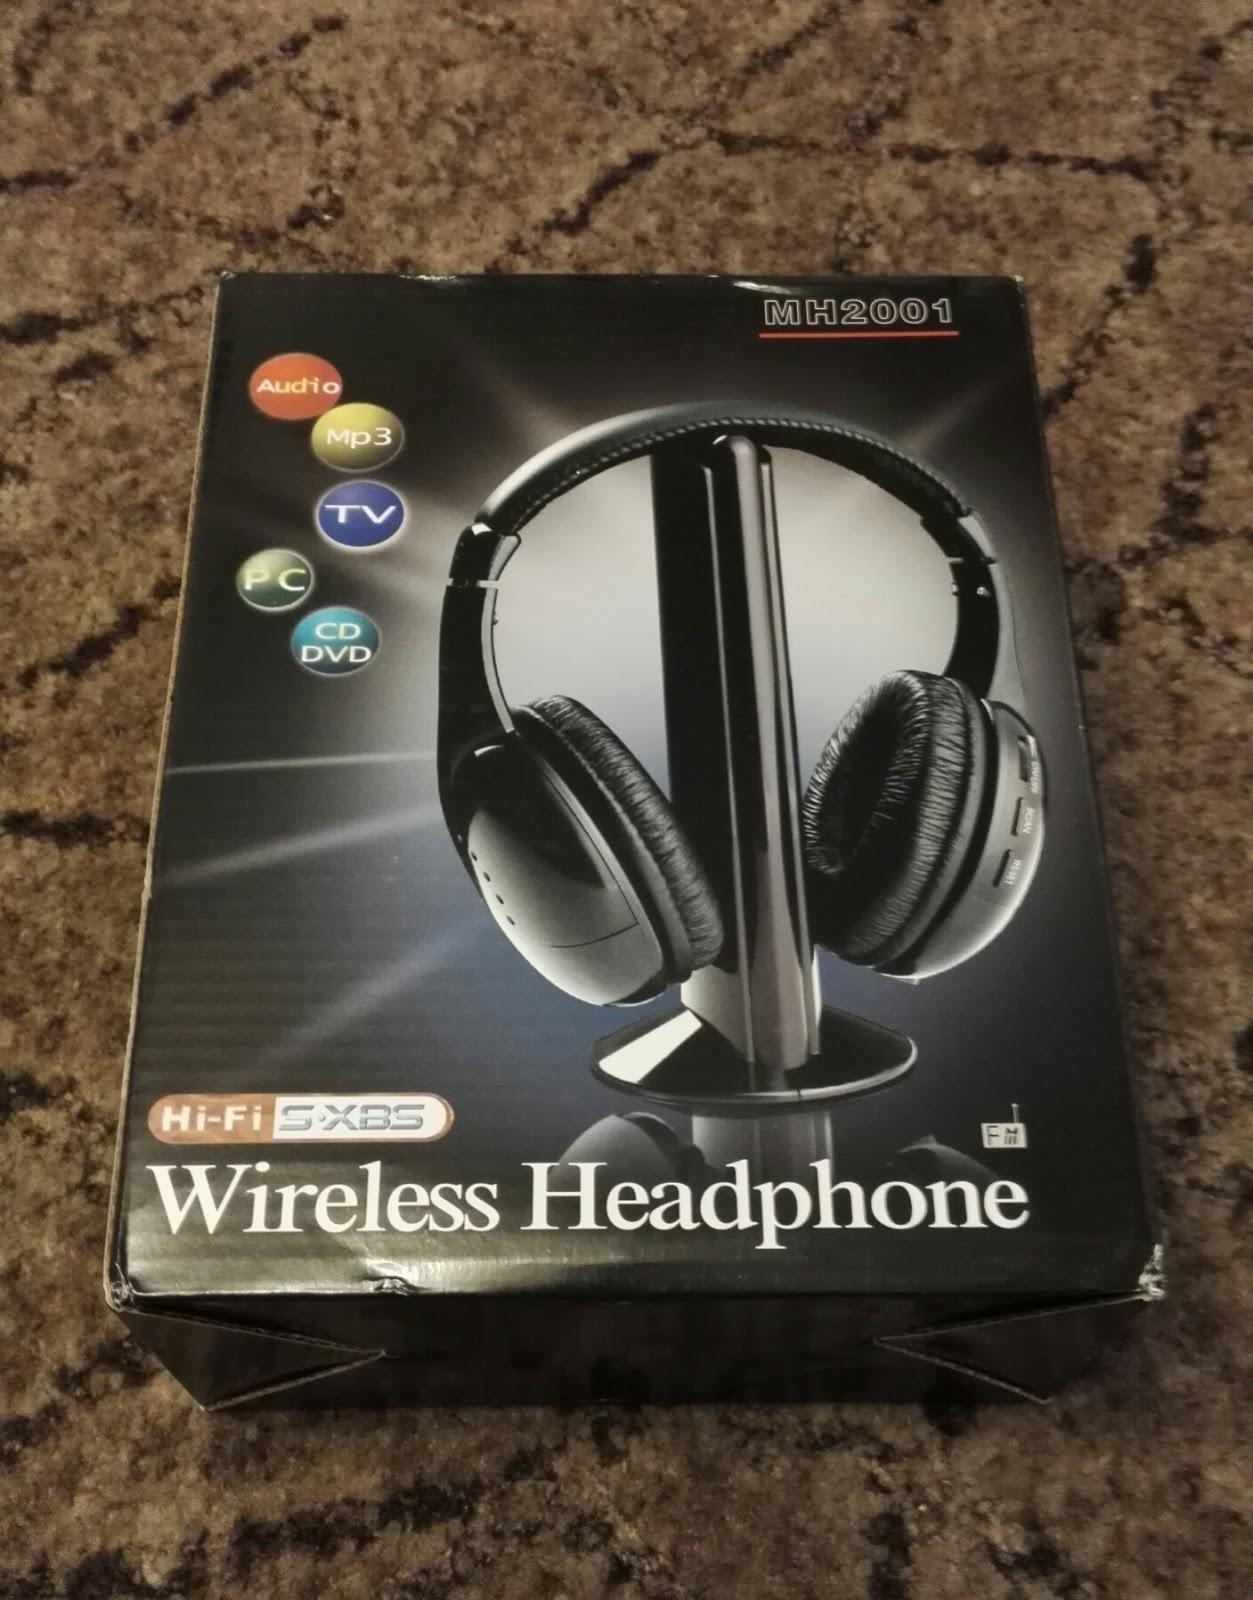 Fuse Box Headphones : Onn wireless headphones with transmitter troubleshooting